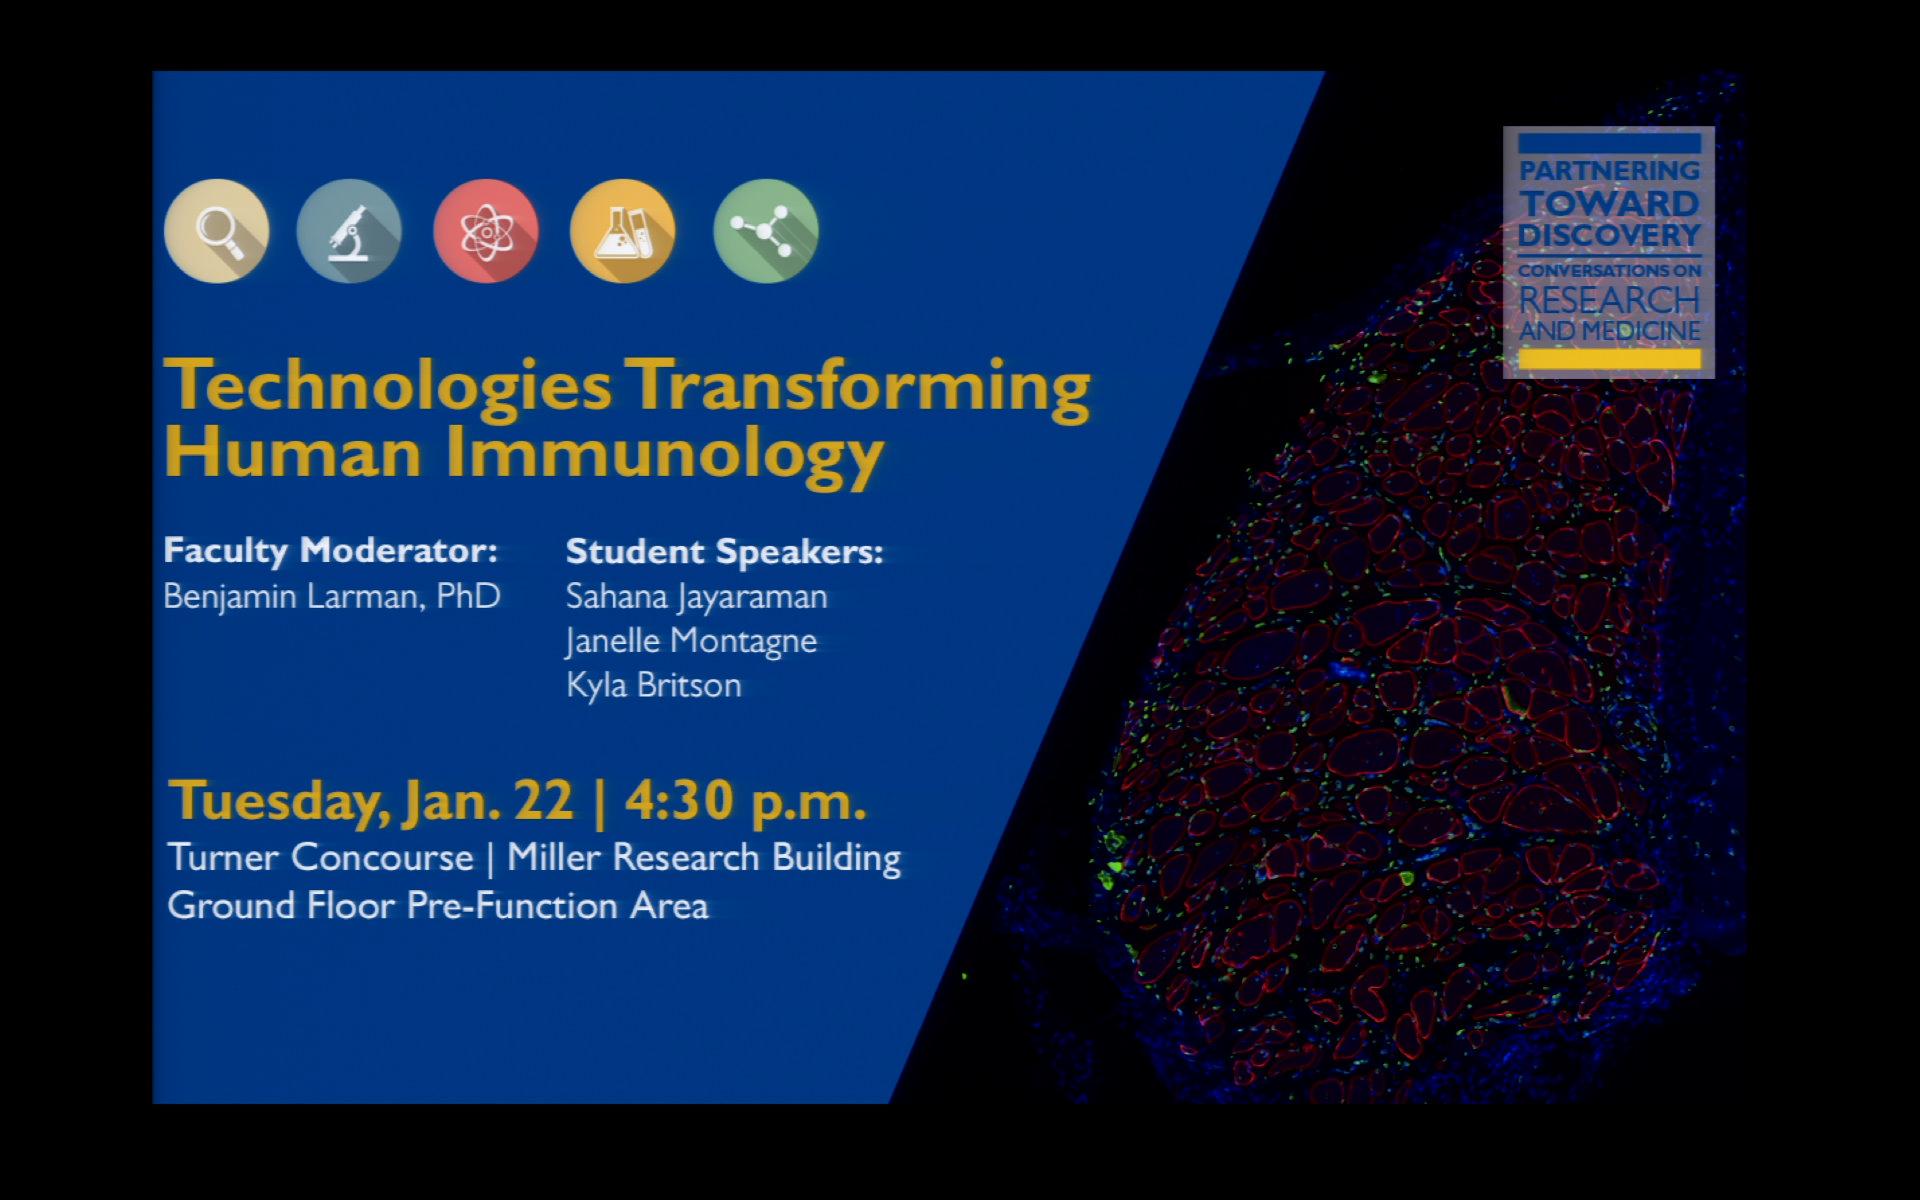 Technologies Transforming Human Immunology